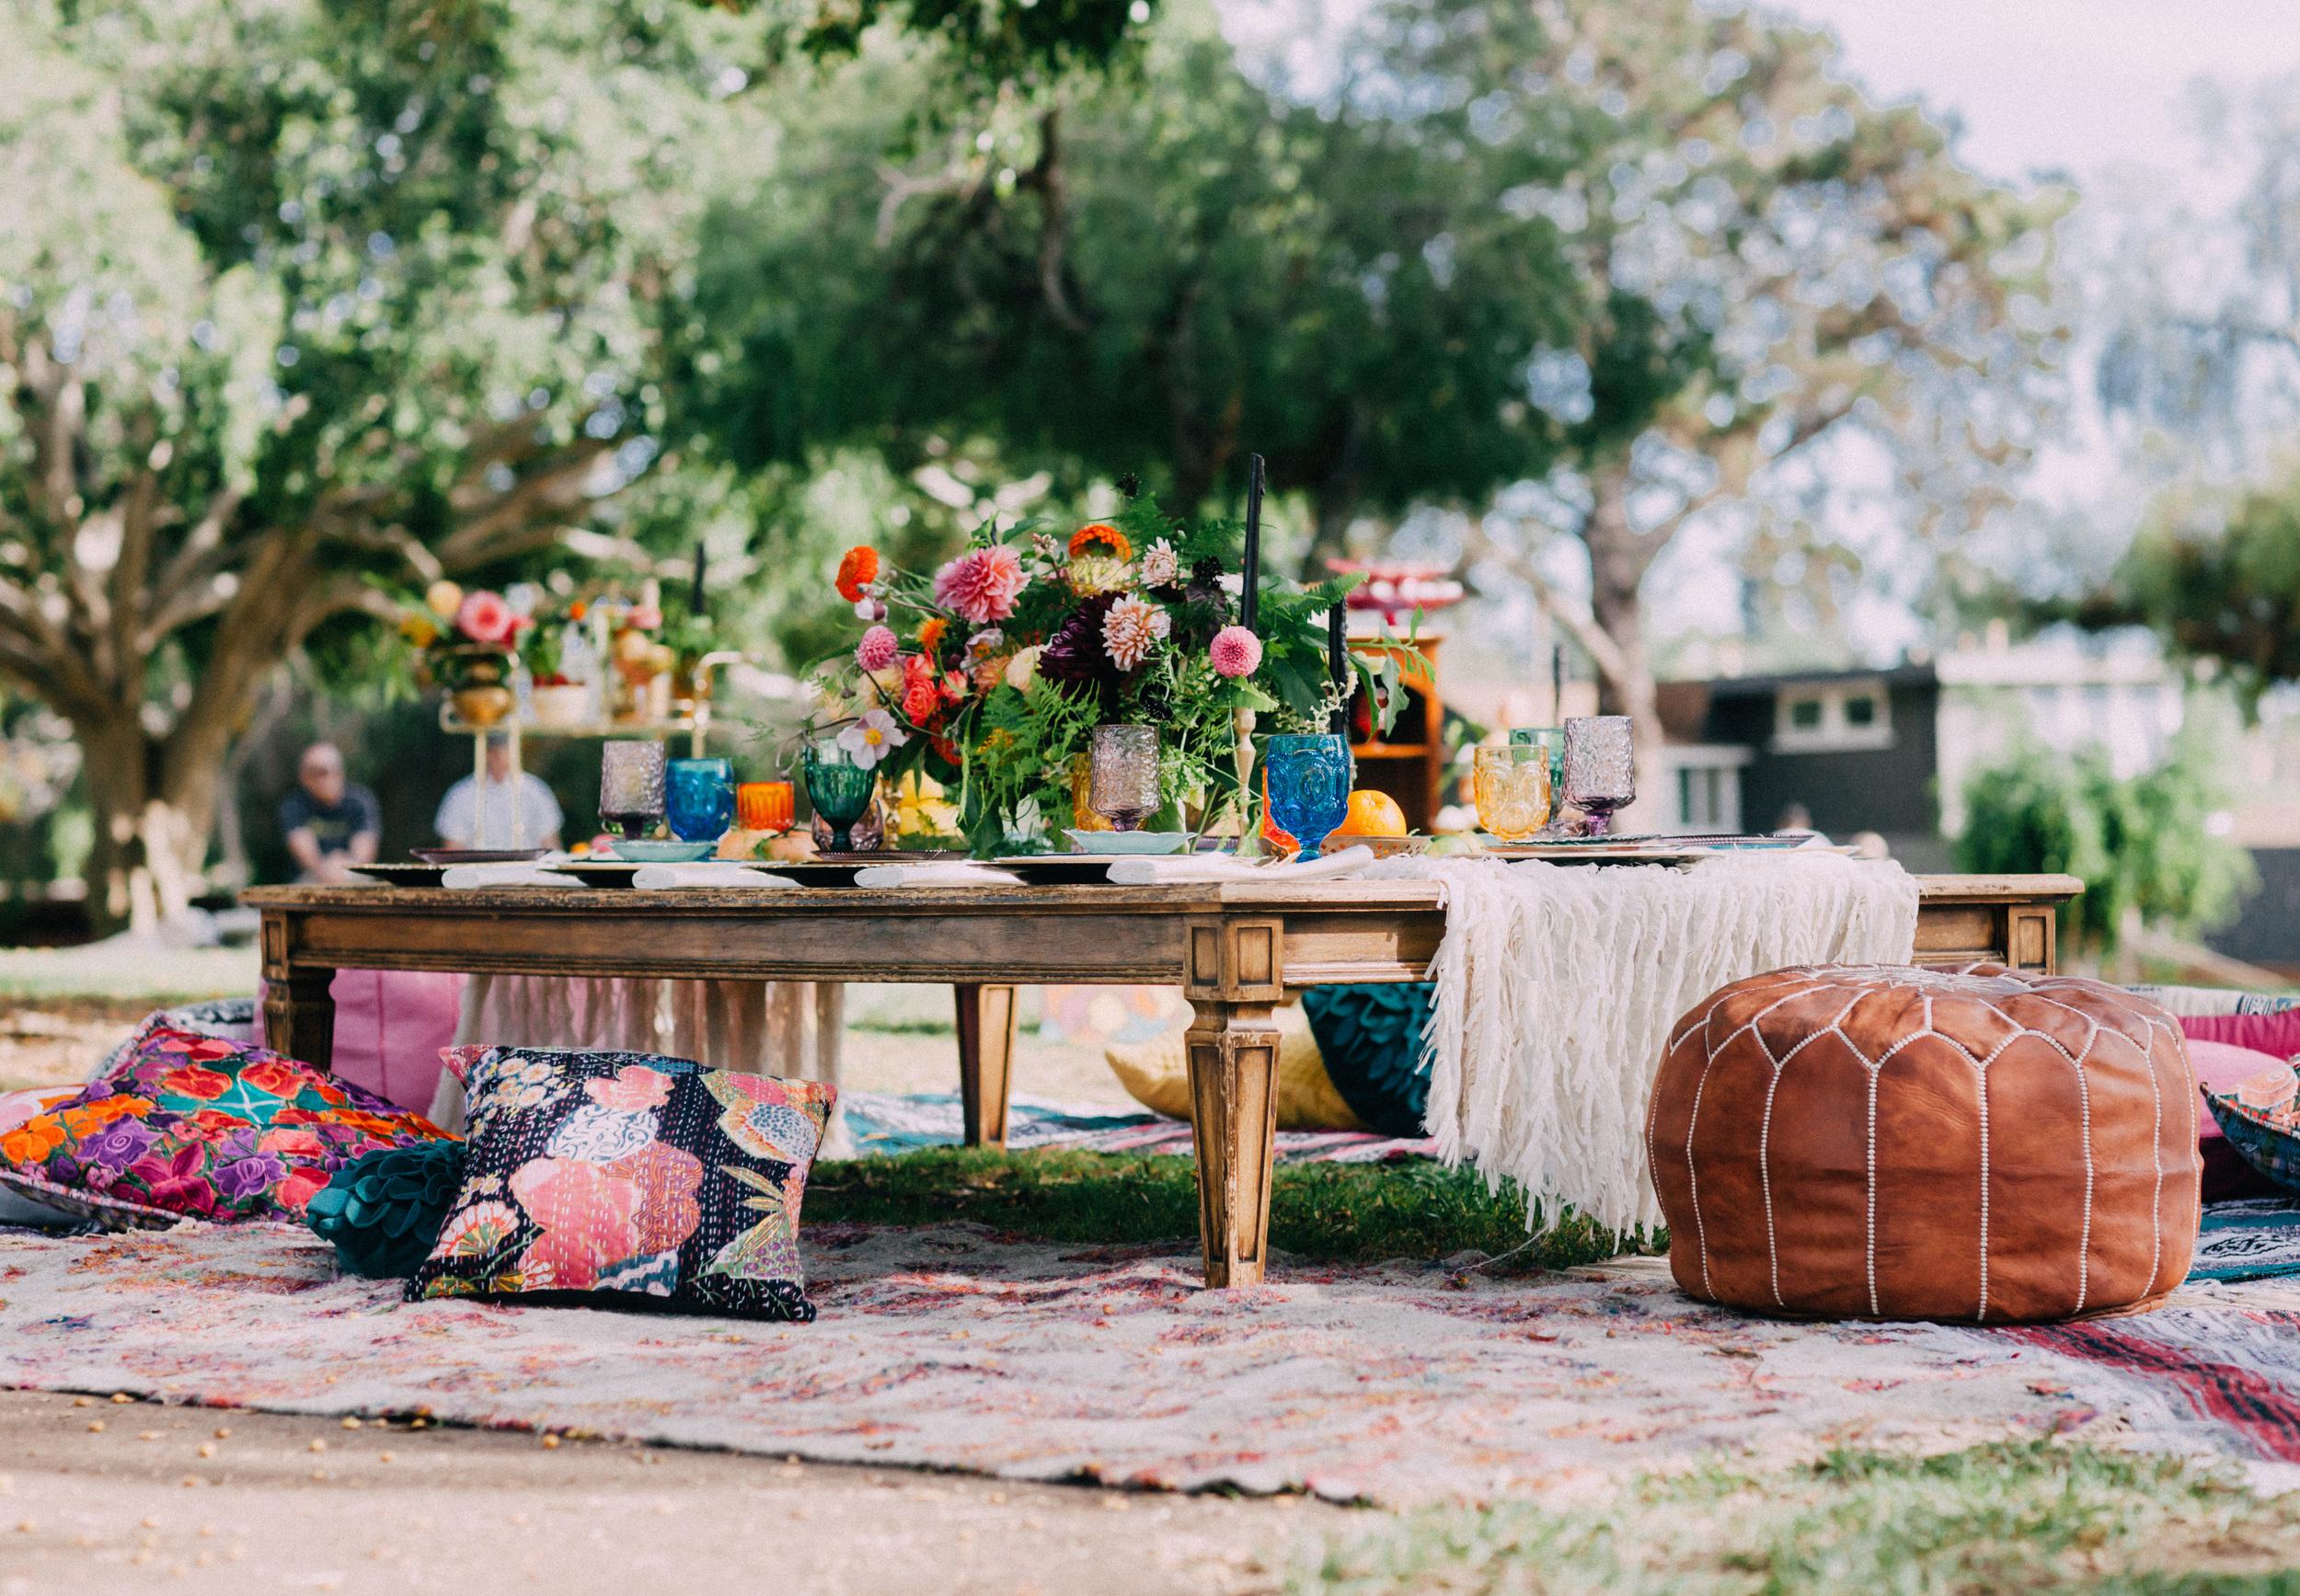 Outdoor bohemian bridal shower picnic